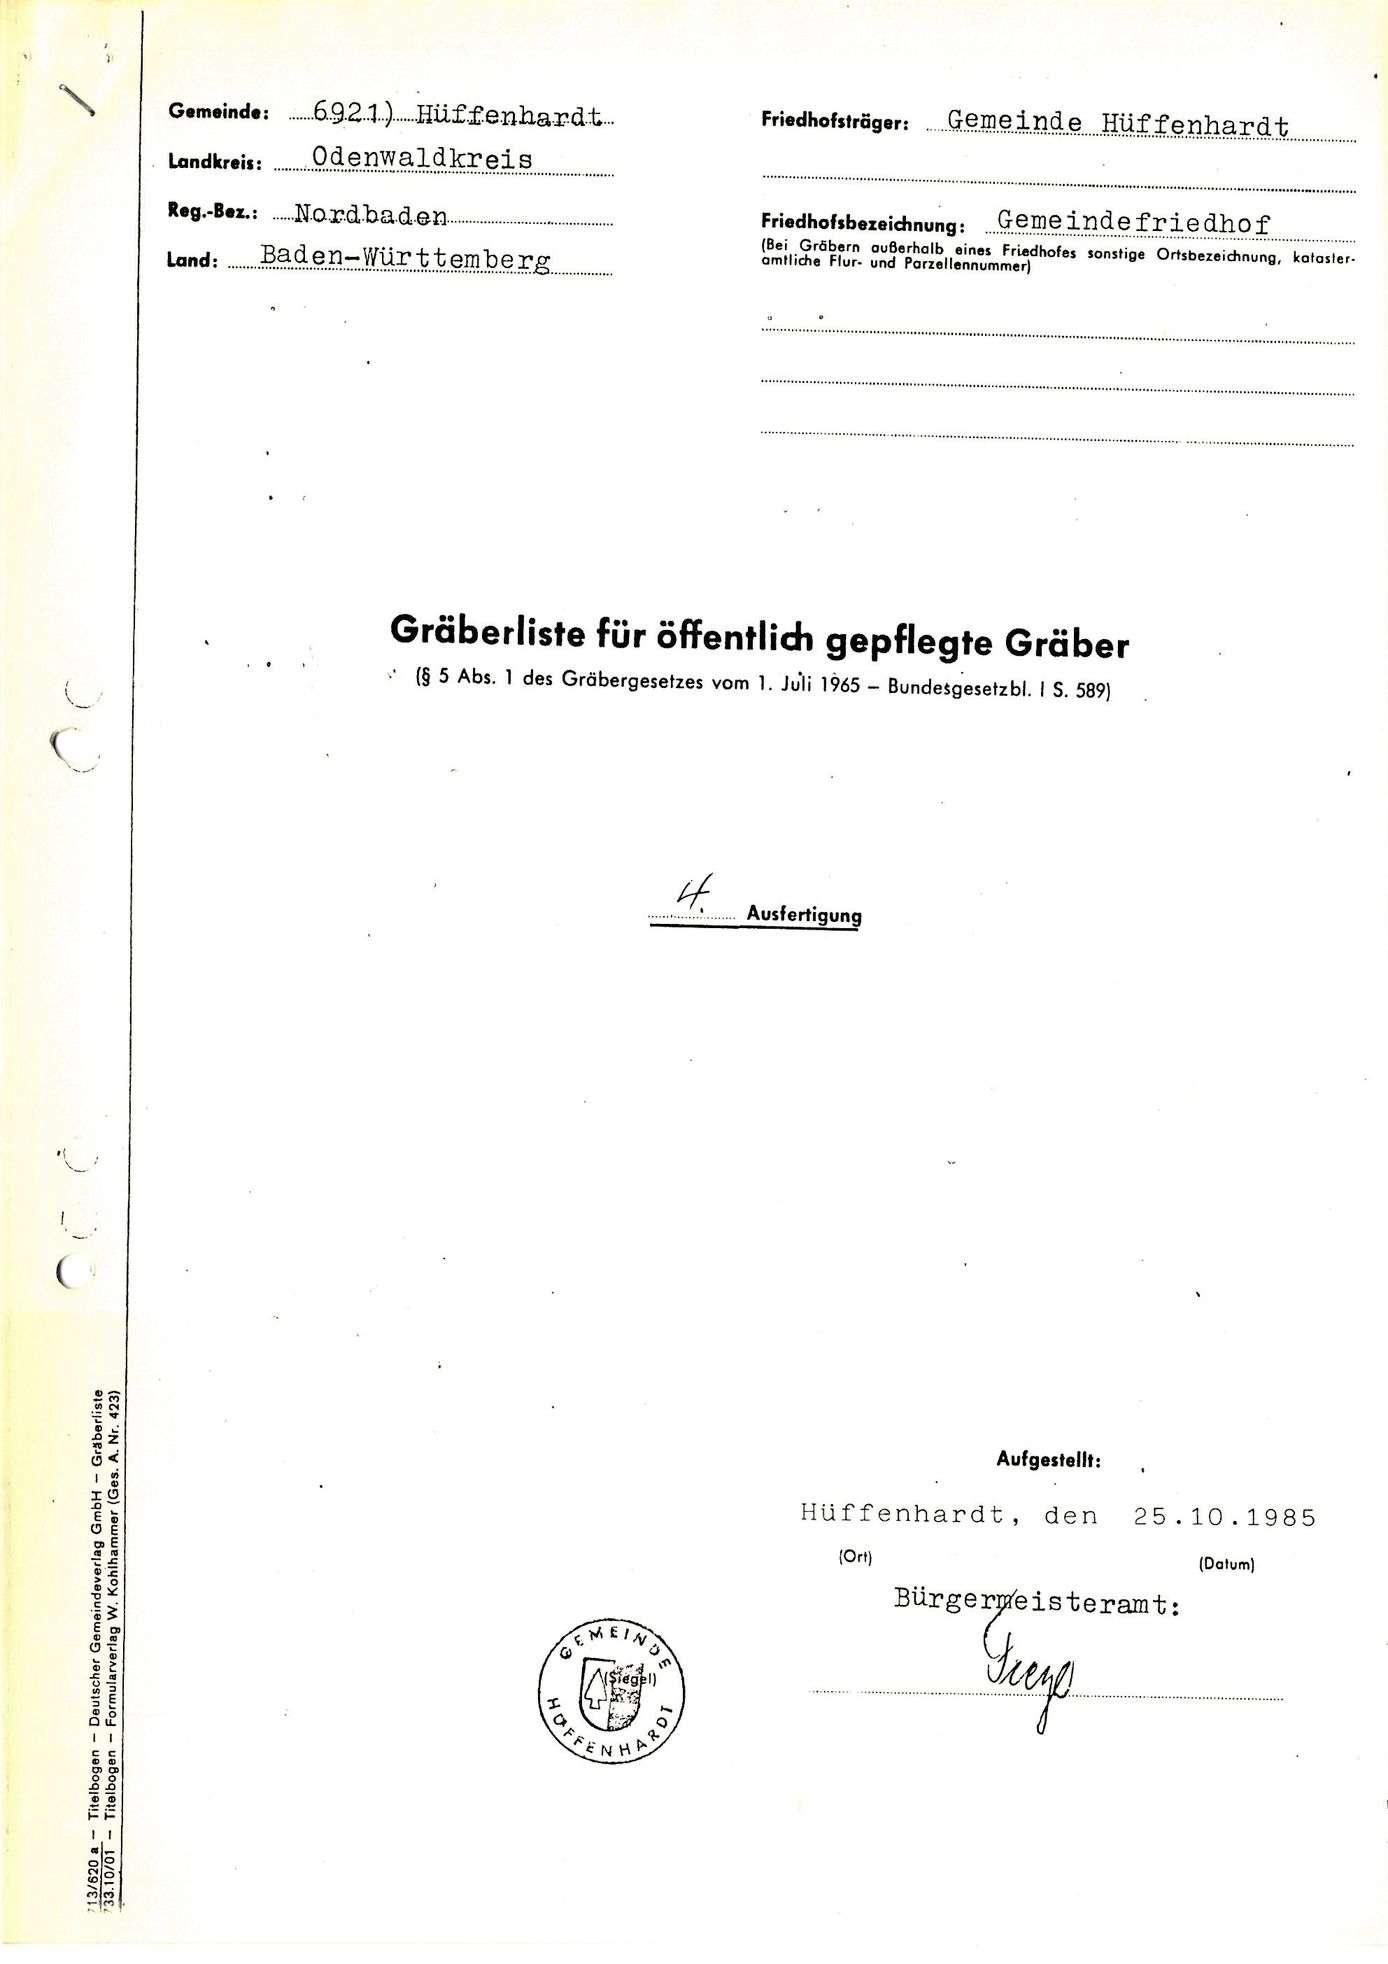 Hüffenhardt, Bild 1